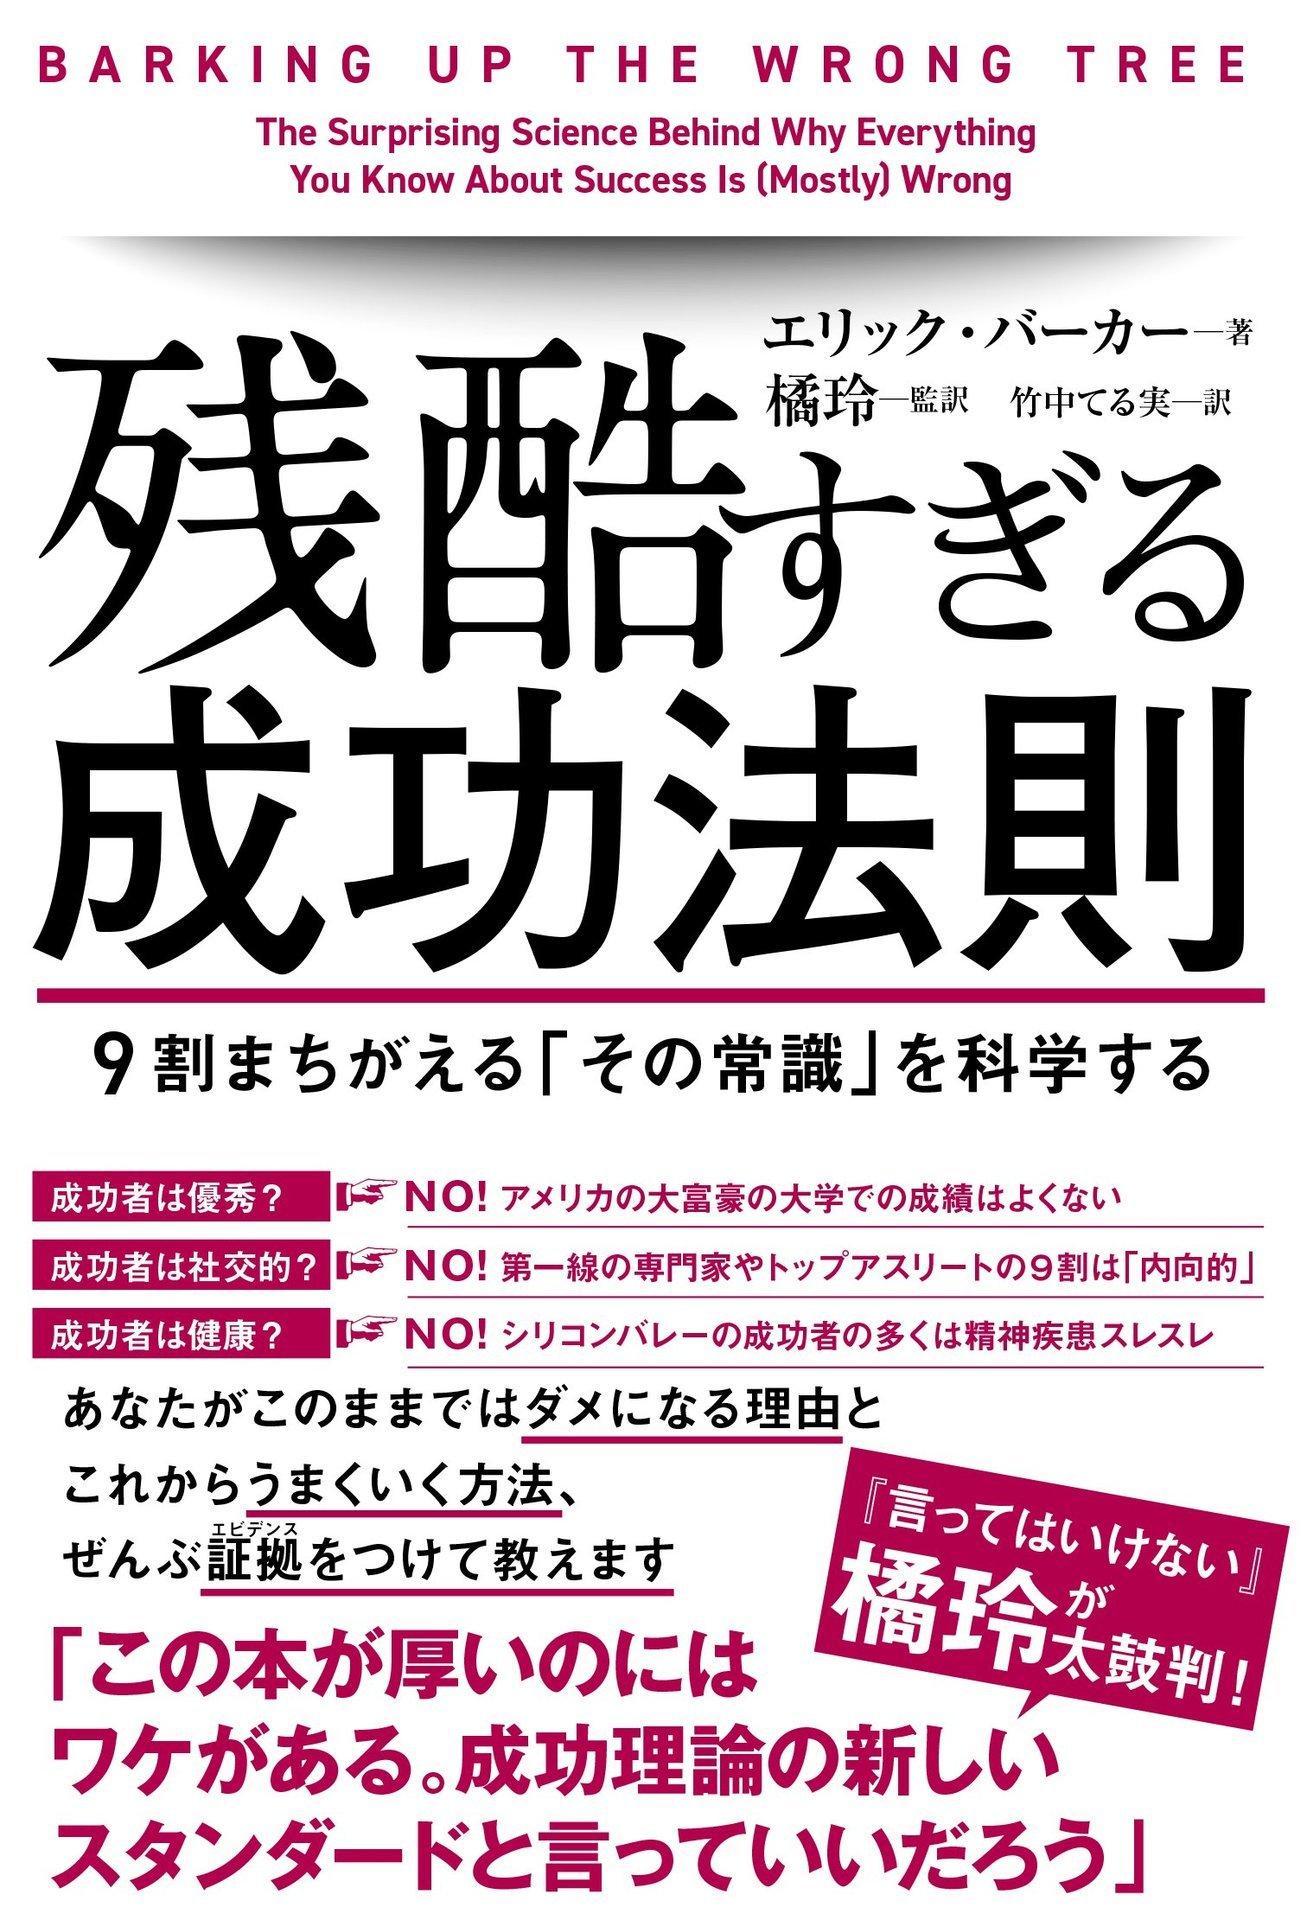 seikouhousoku.jpg